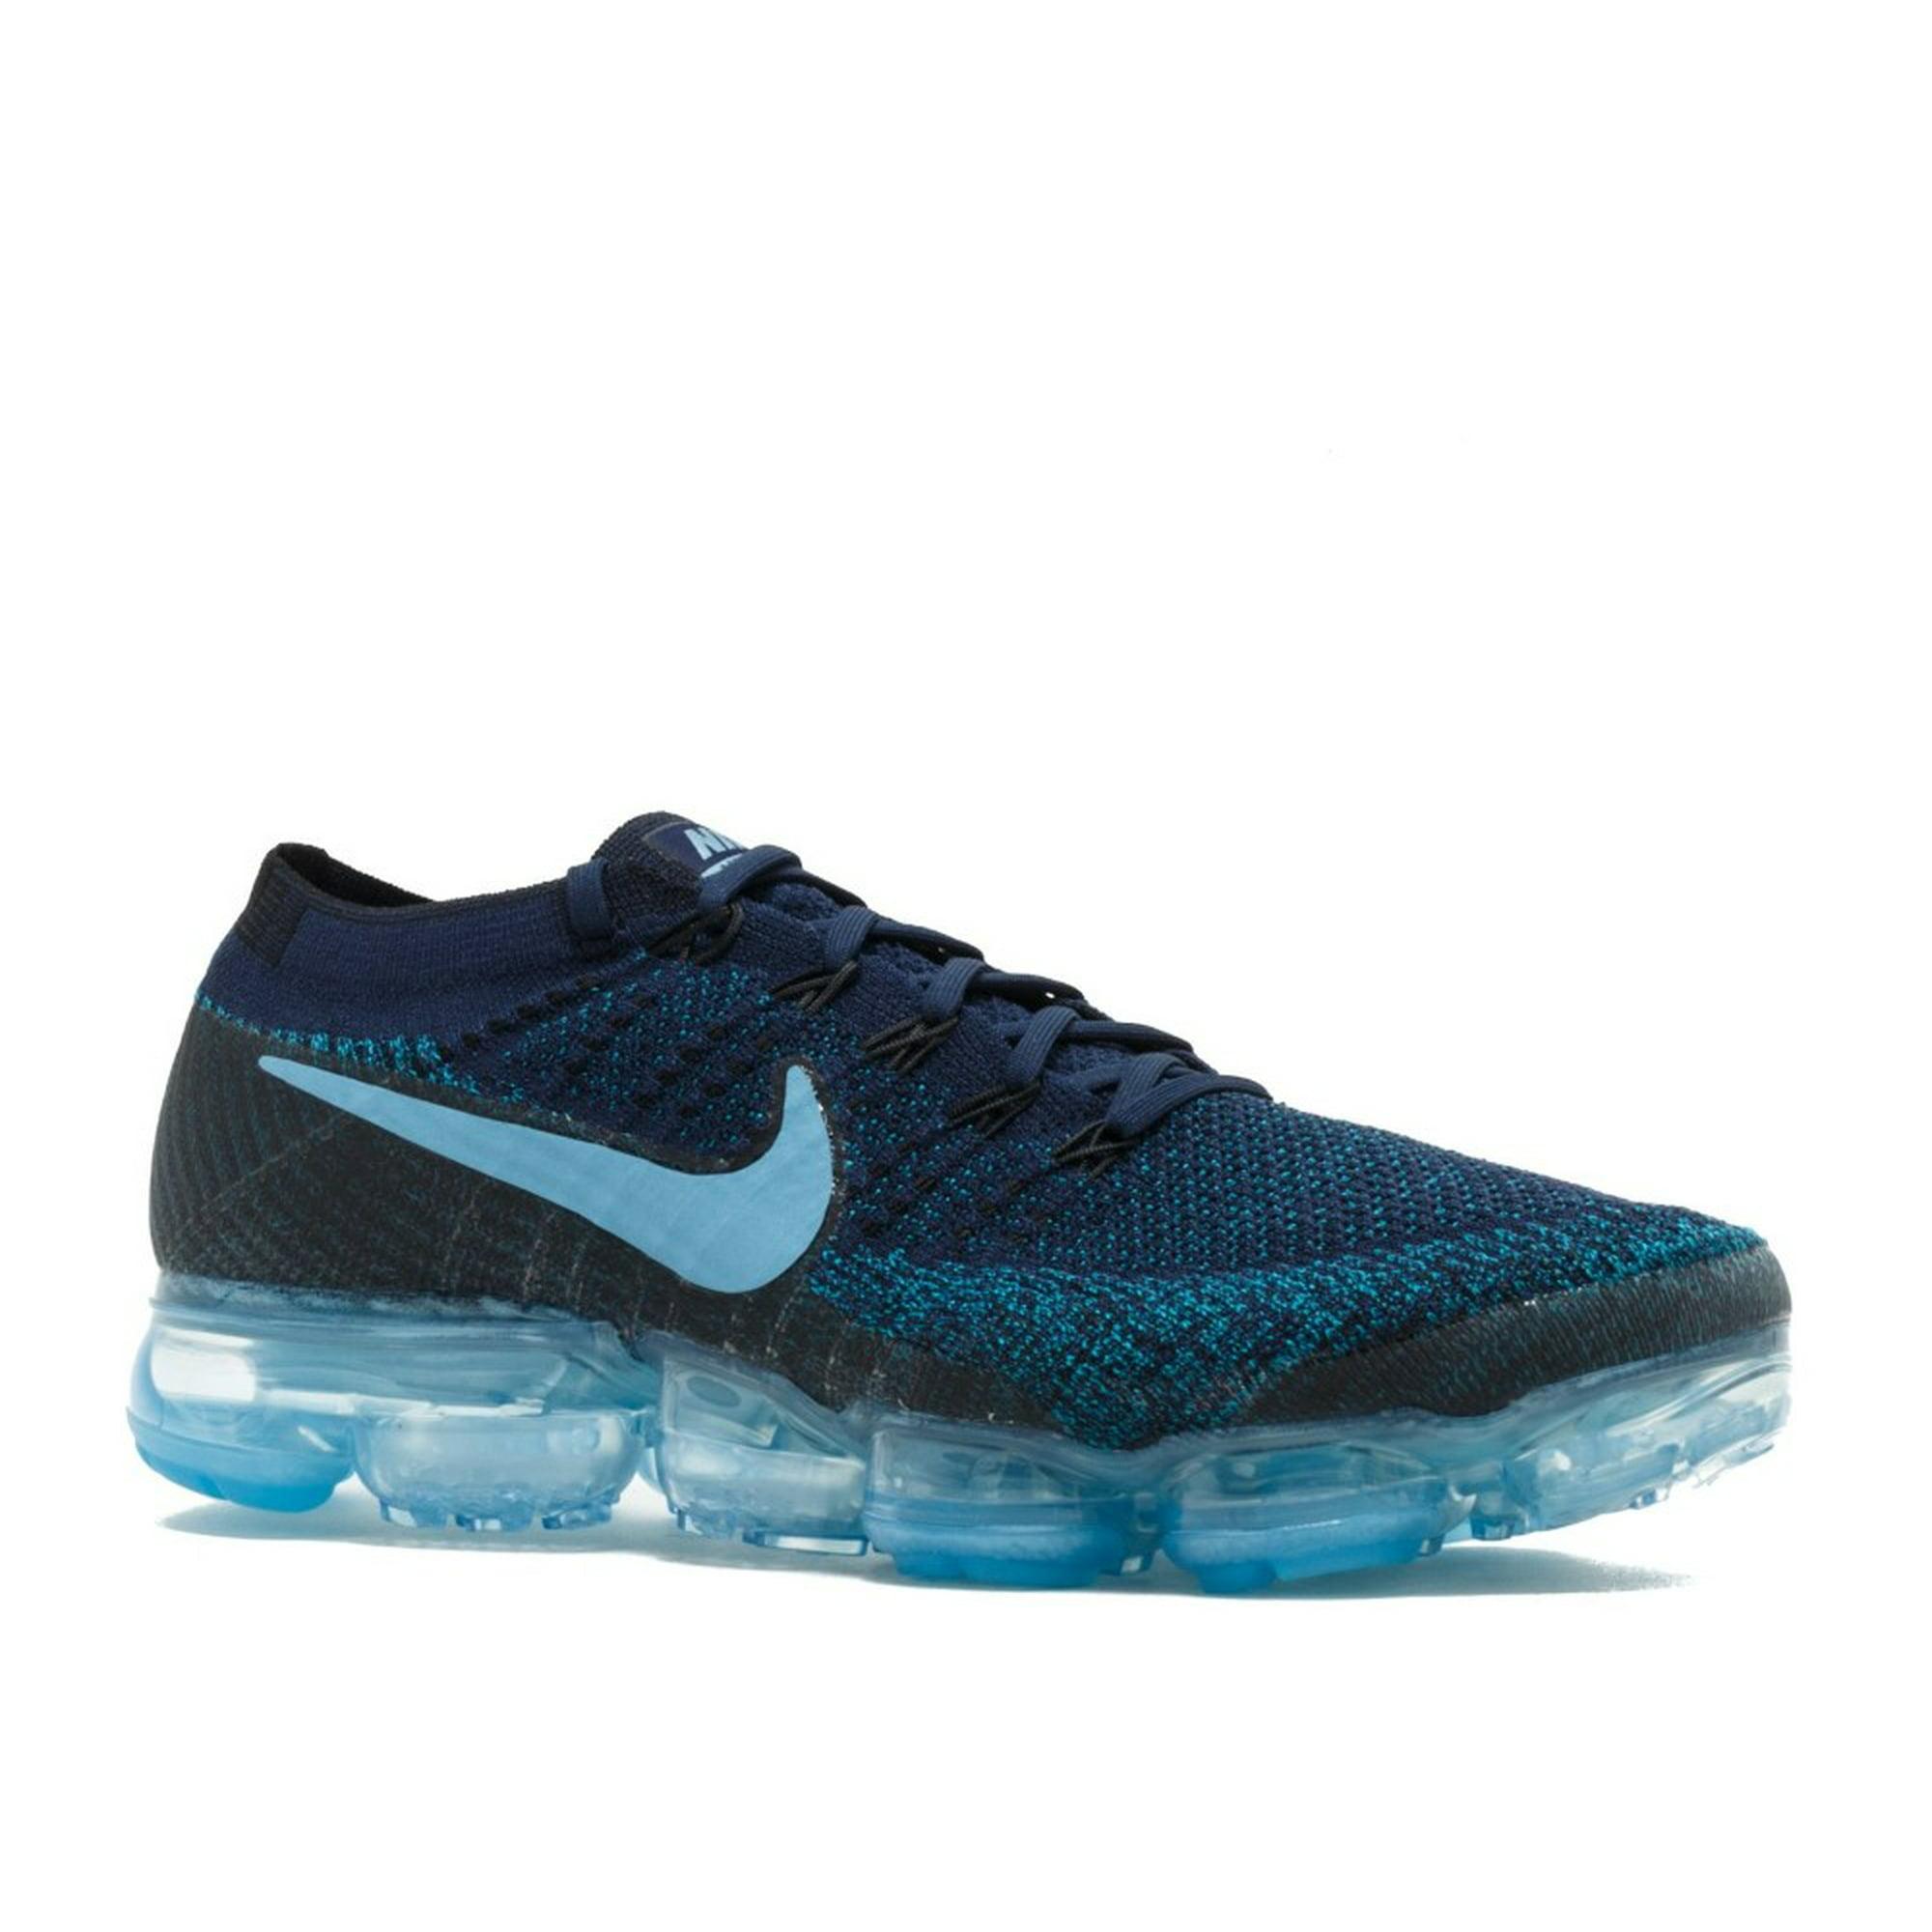 sports shoes 8f953 b7c4e Nike - Men - Nike Air Vapormax Flyknit 'Jd Sports' - 849558 ...